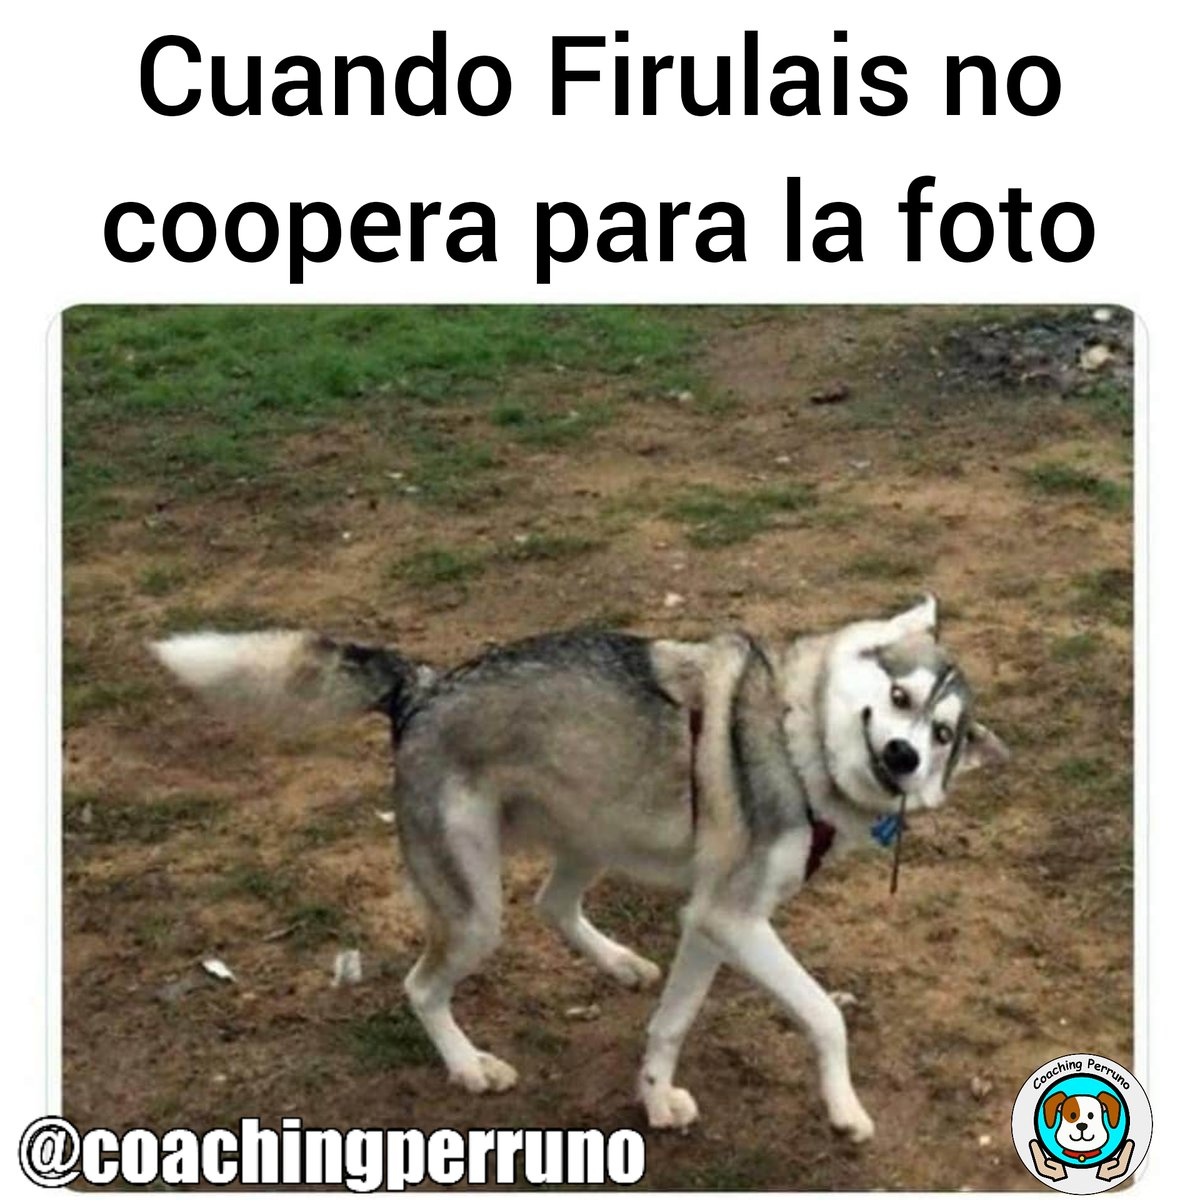 Siempre con buena estampa #perros #dogs #mascotas #petsoftheday #petstagram #dogstagram #coachingperruno #funnypets #pets #ilovedogs#petslovers #funnydogs #dogslovers #huskypic.twitter.com/T0HN9hIyff